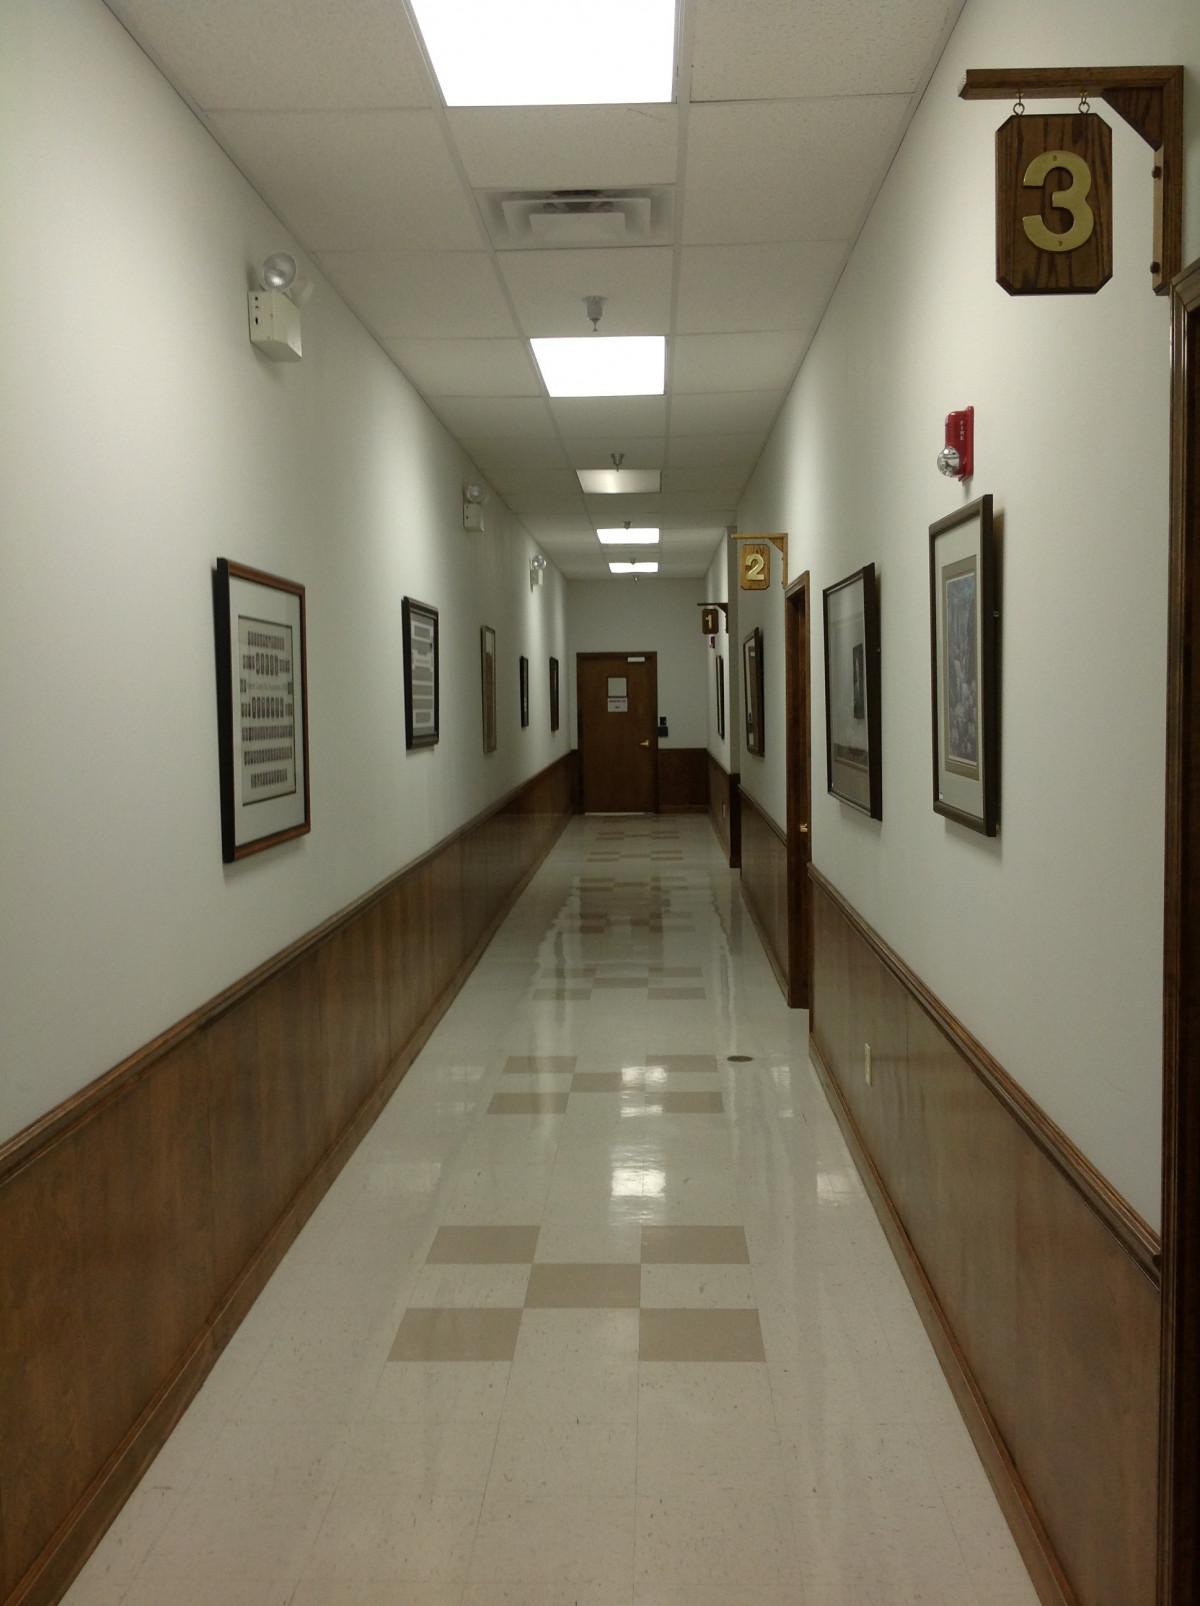 Free Images : floor, building, walkway, museum, hall ...